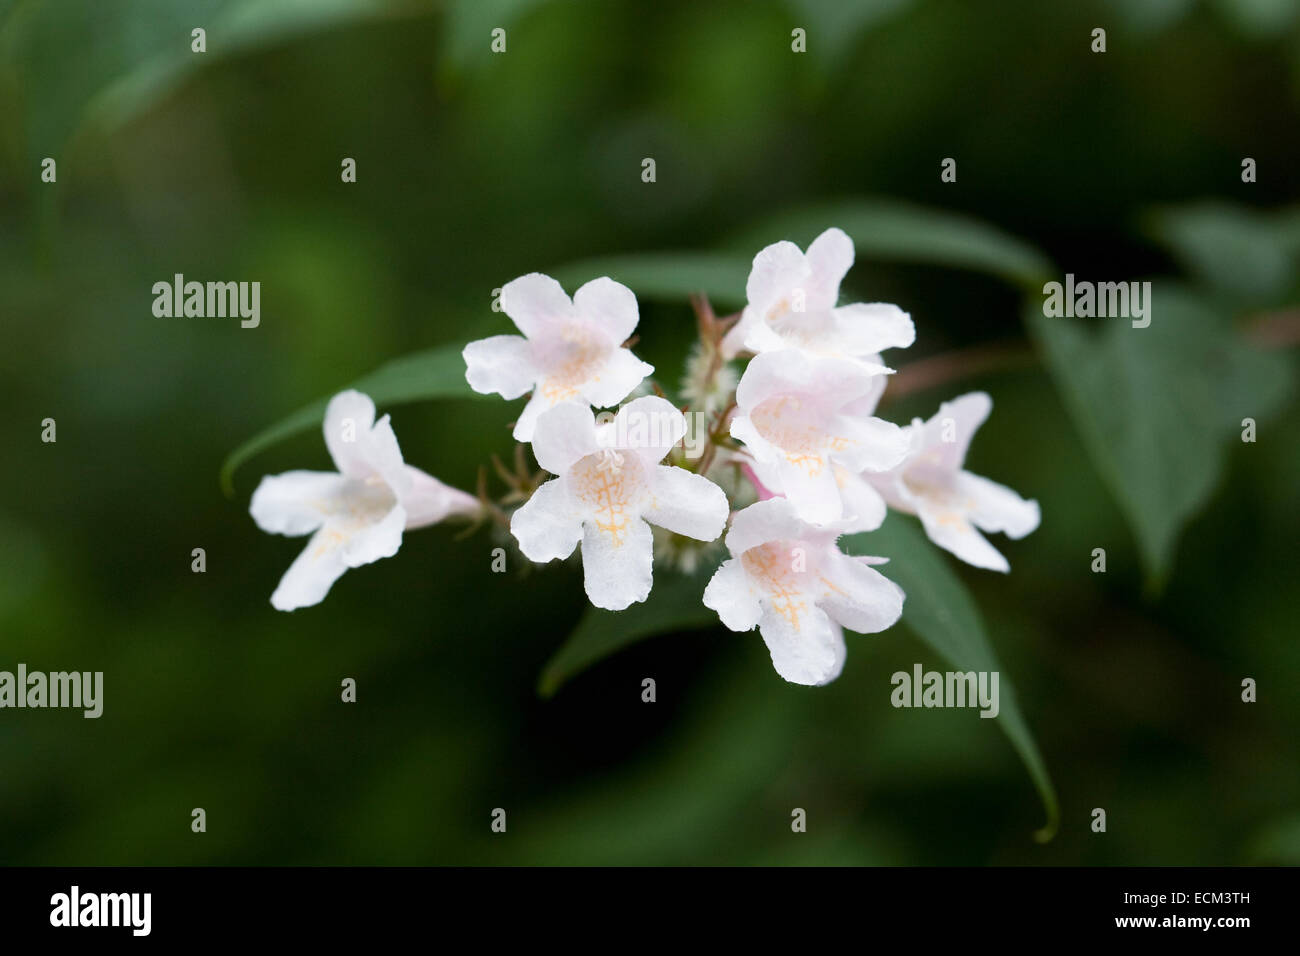 Dipelta floribunda. Rosy dipelta flowers. - Stock Image